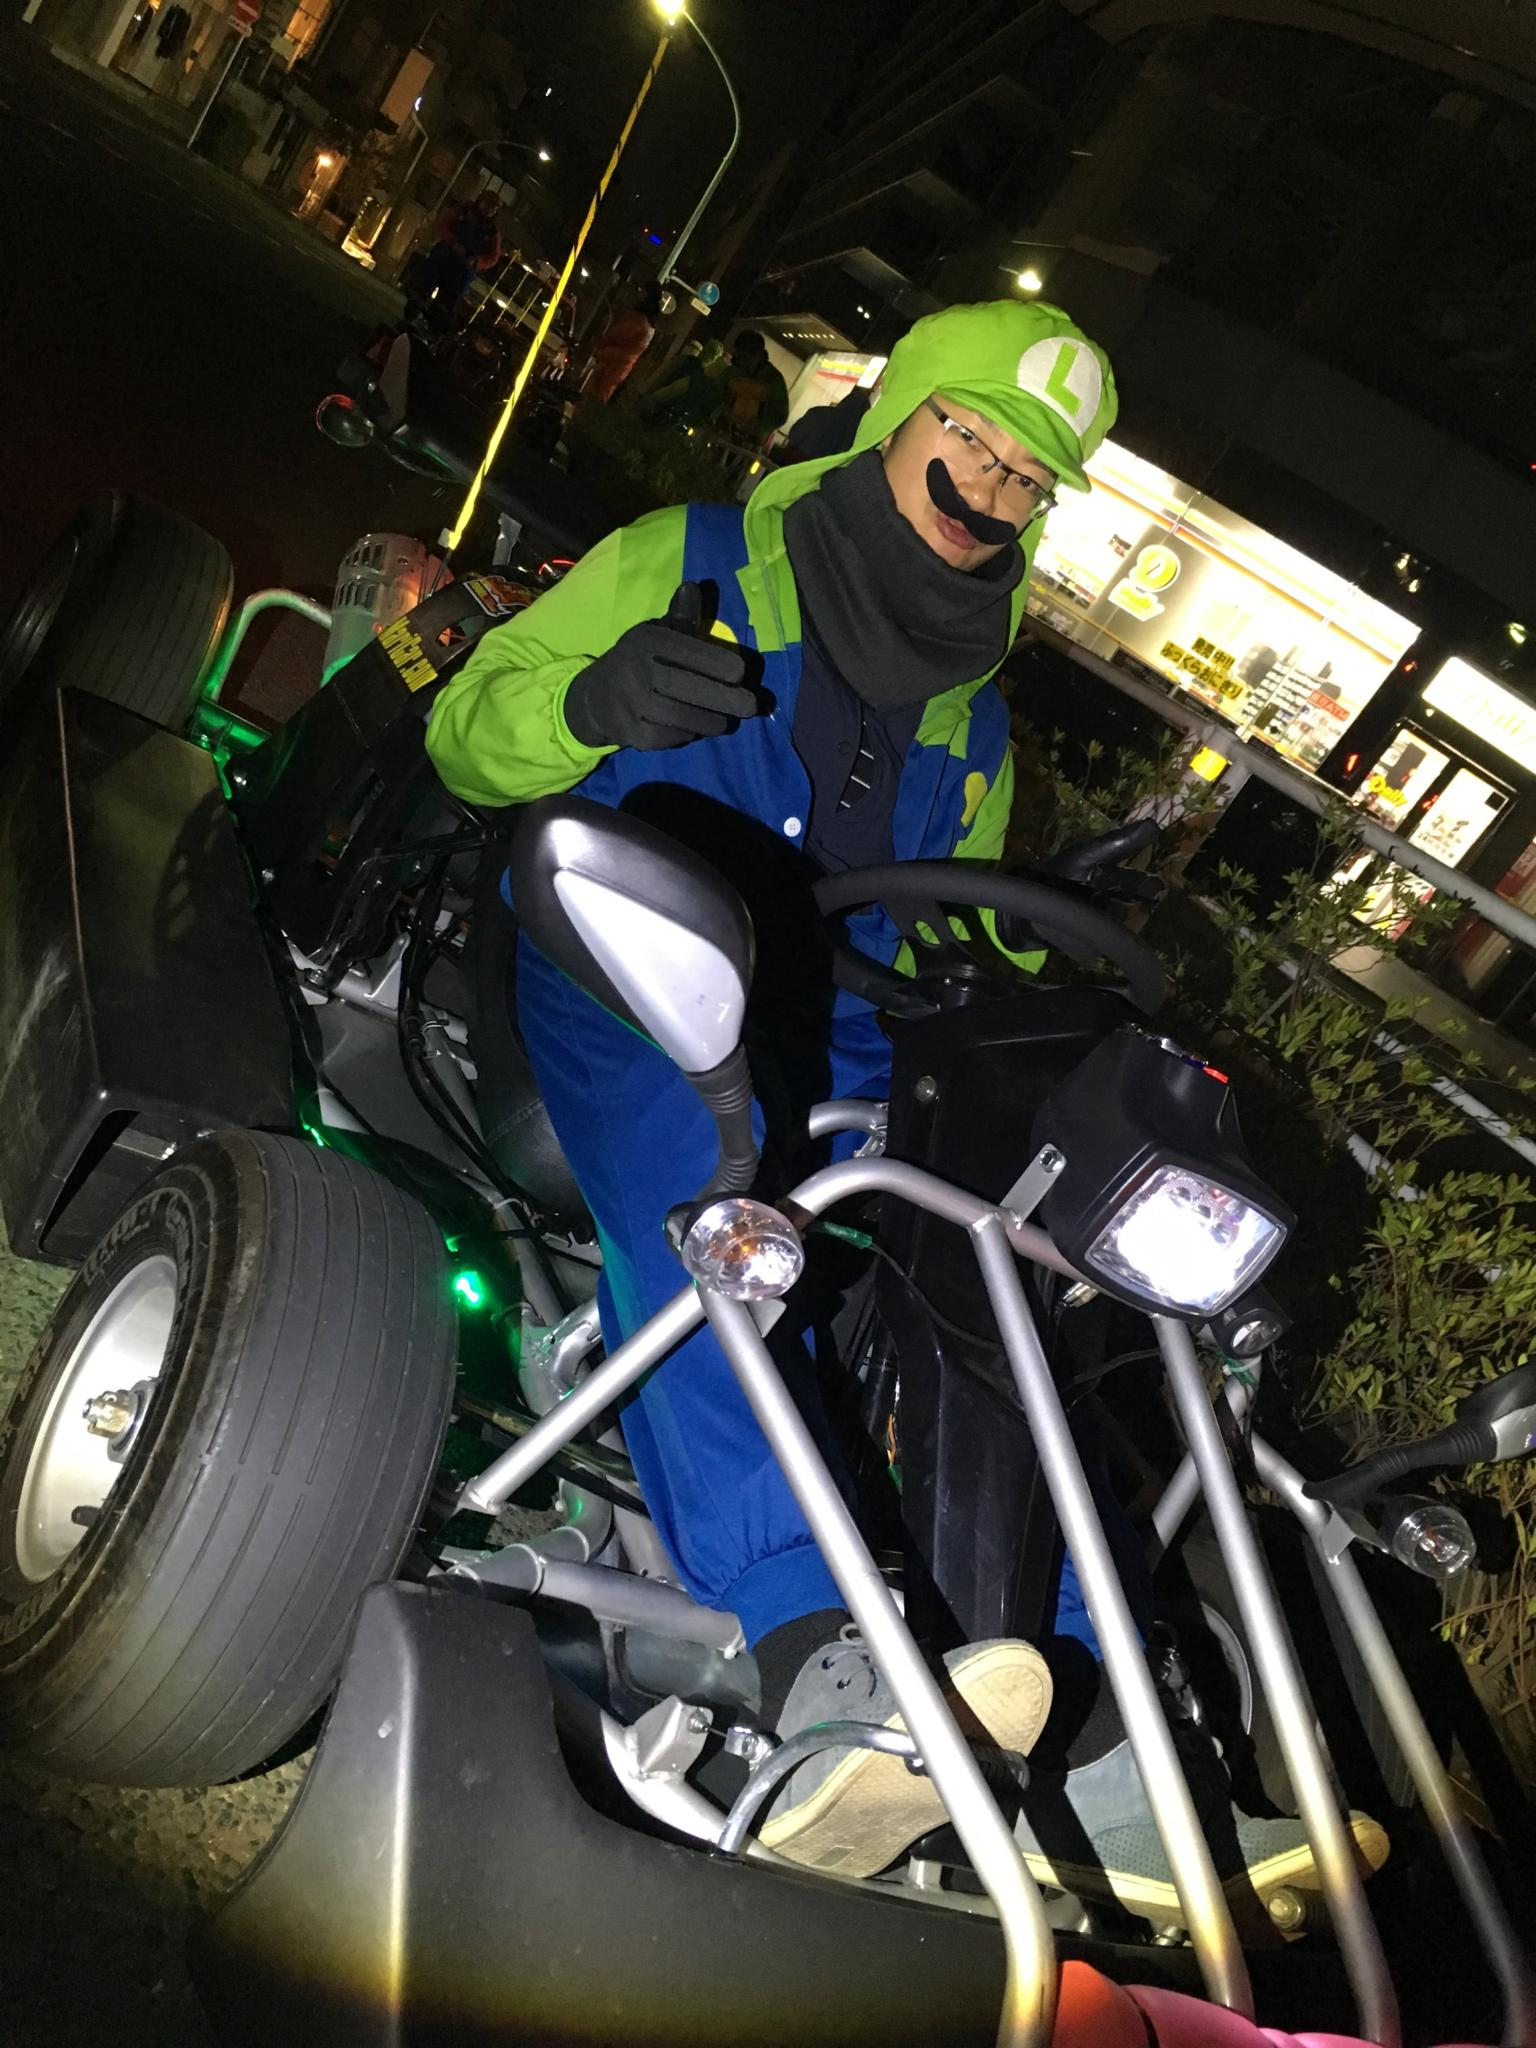 MariCAR go-kart